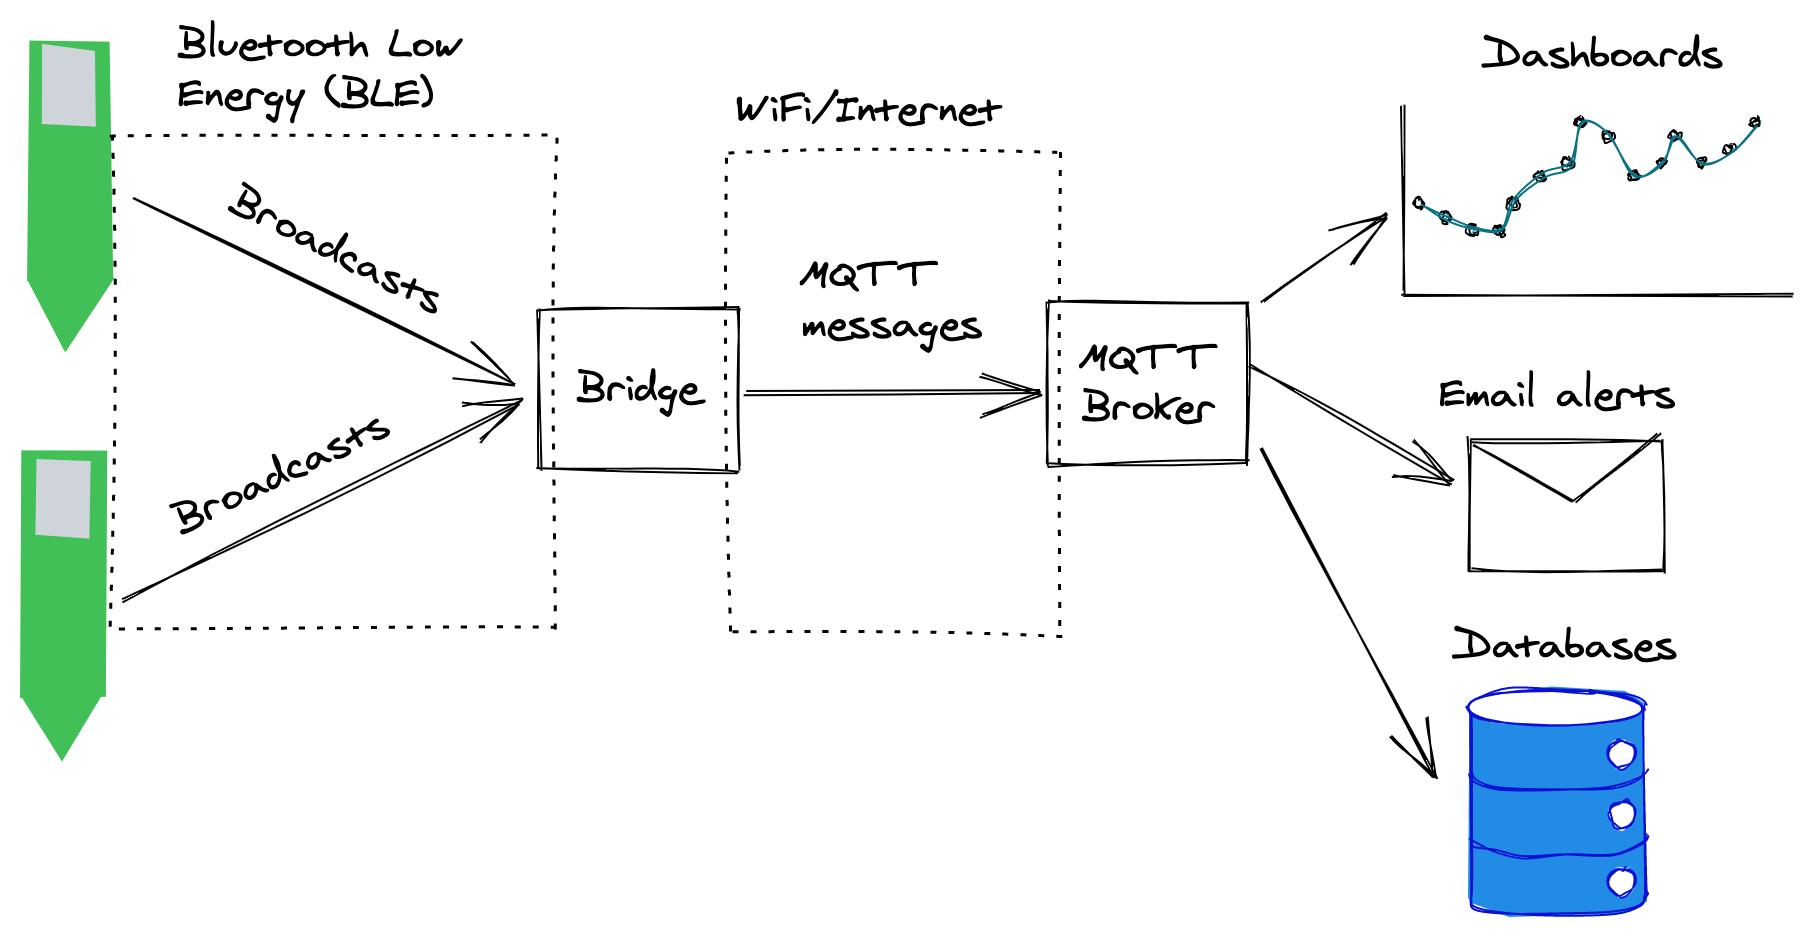 Diagram containing two b-parasites, a bridge & an MQTT broker